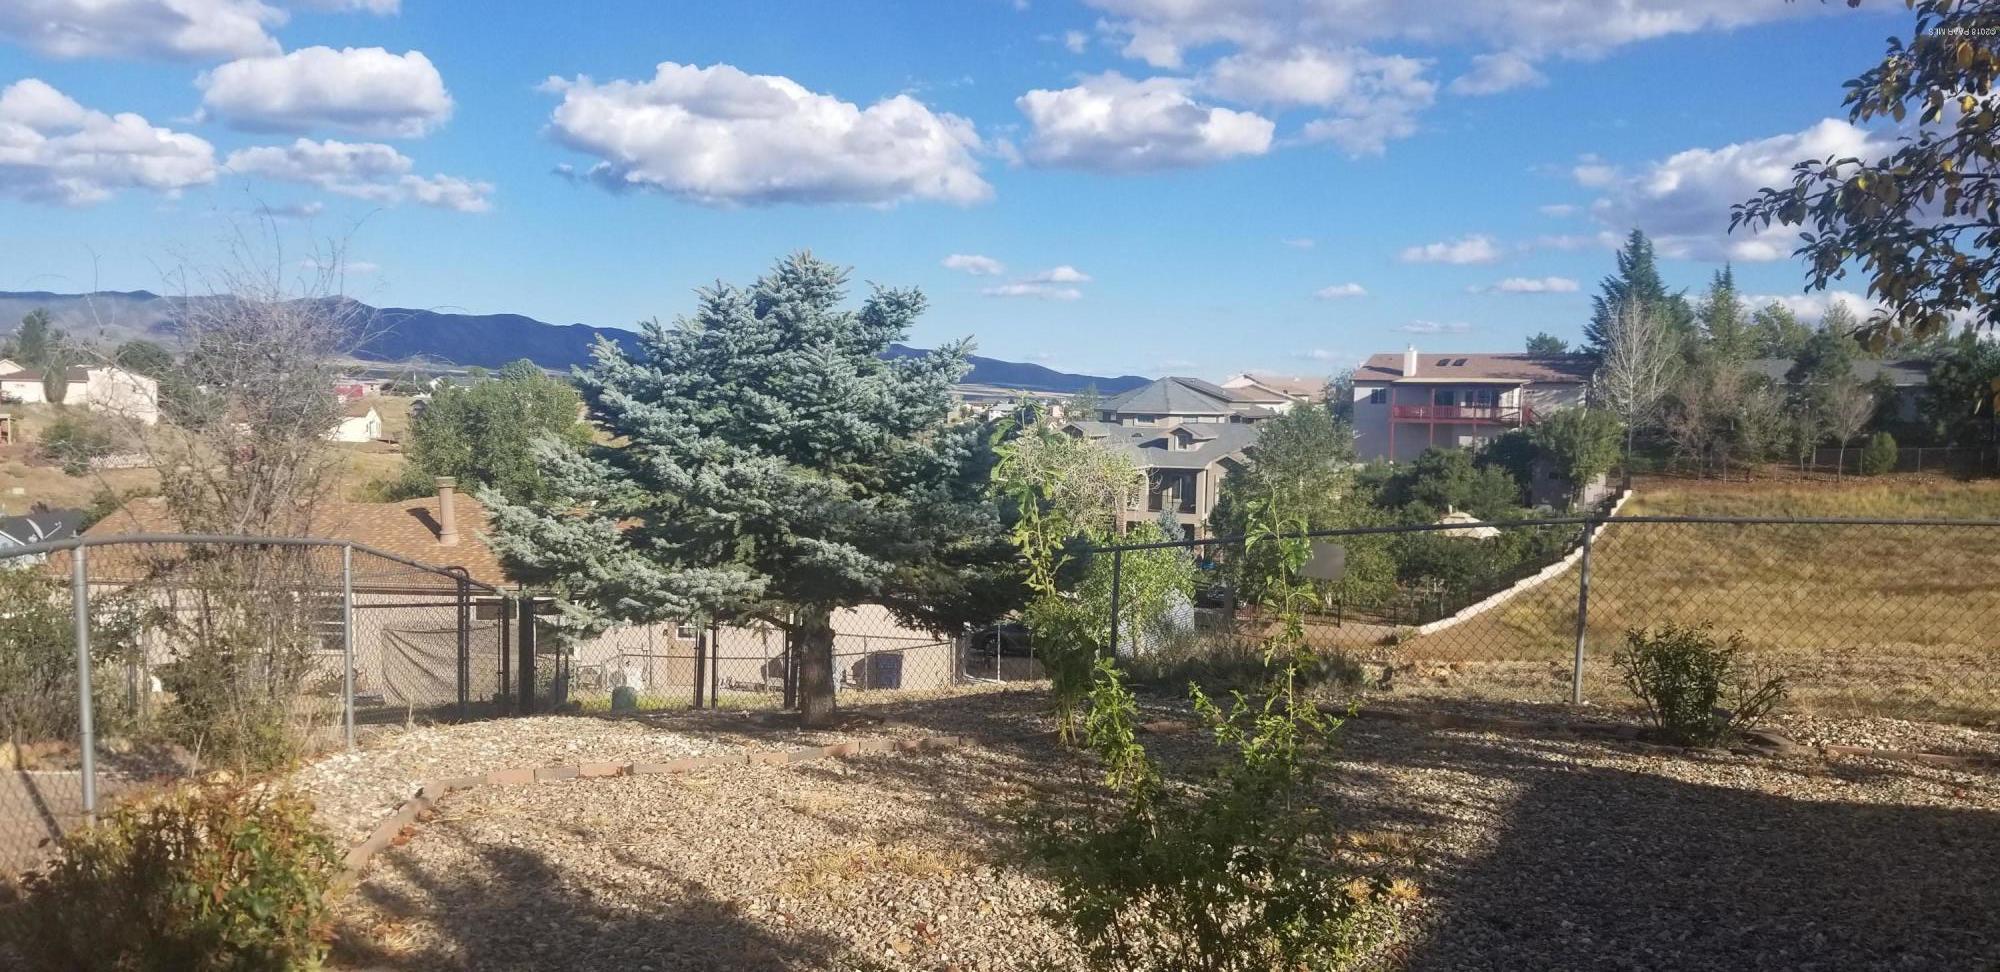 4795 N Glenrosa Circle Prescott Valley, AZ 86314 - MLS #: 1015941